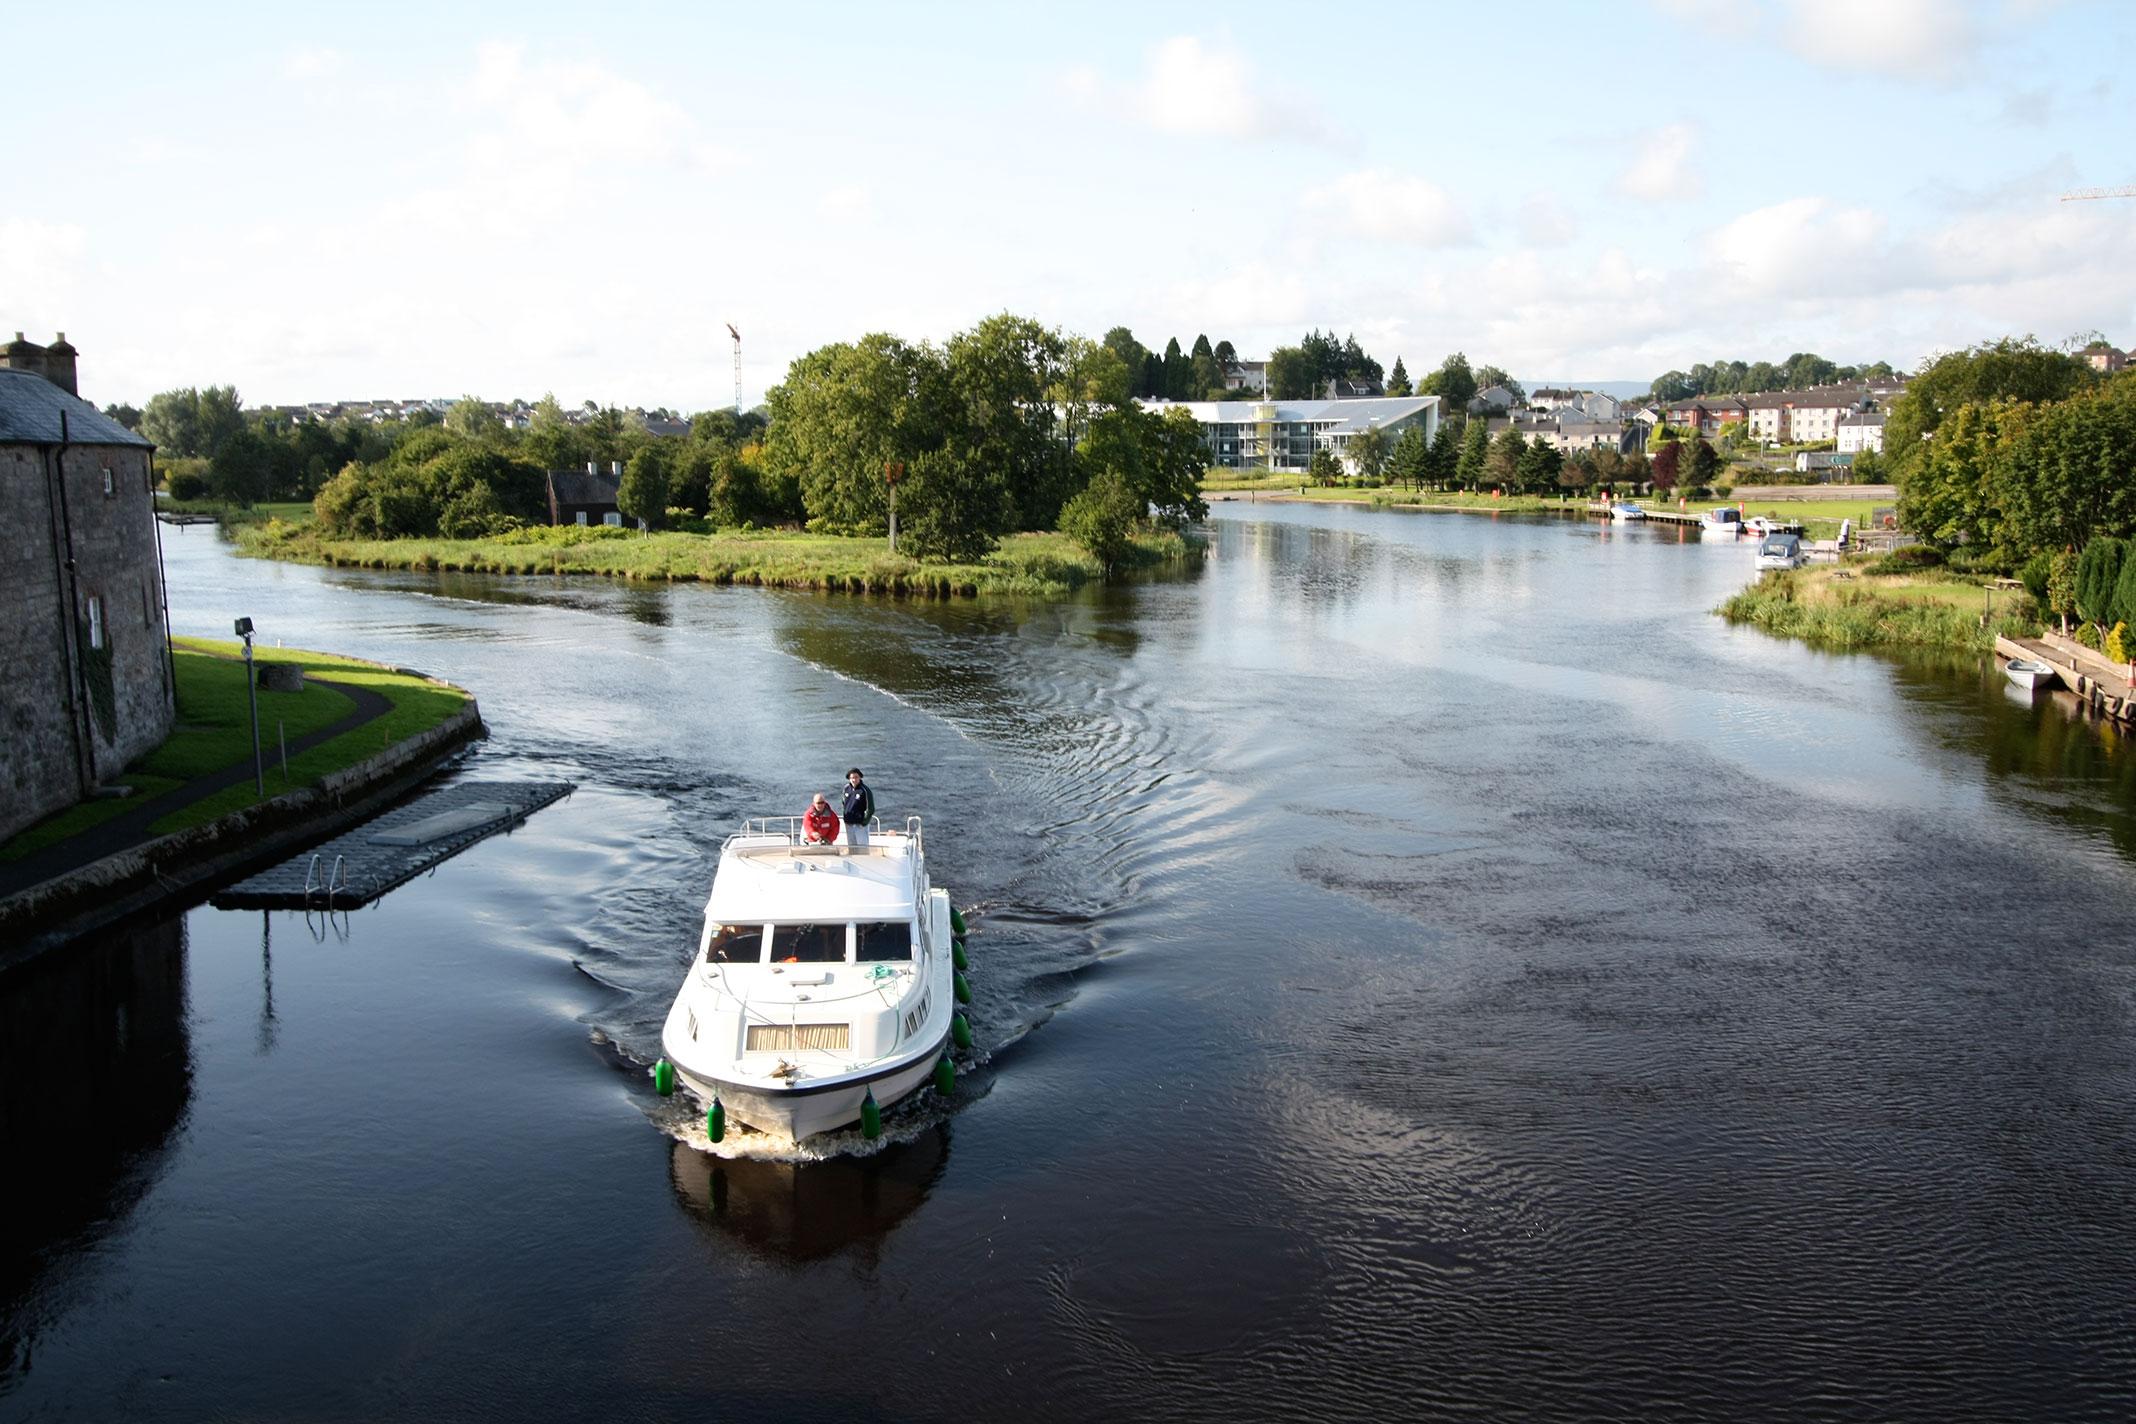 21_Waterways_Ireland_3034-REDU.jpg